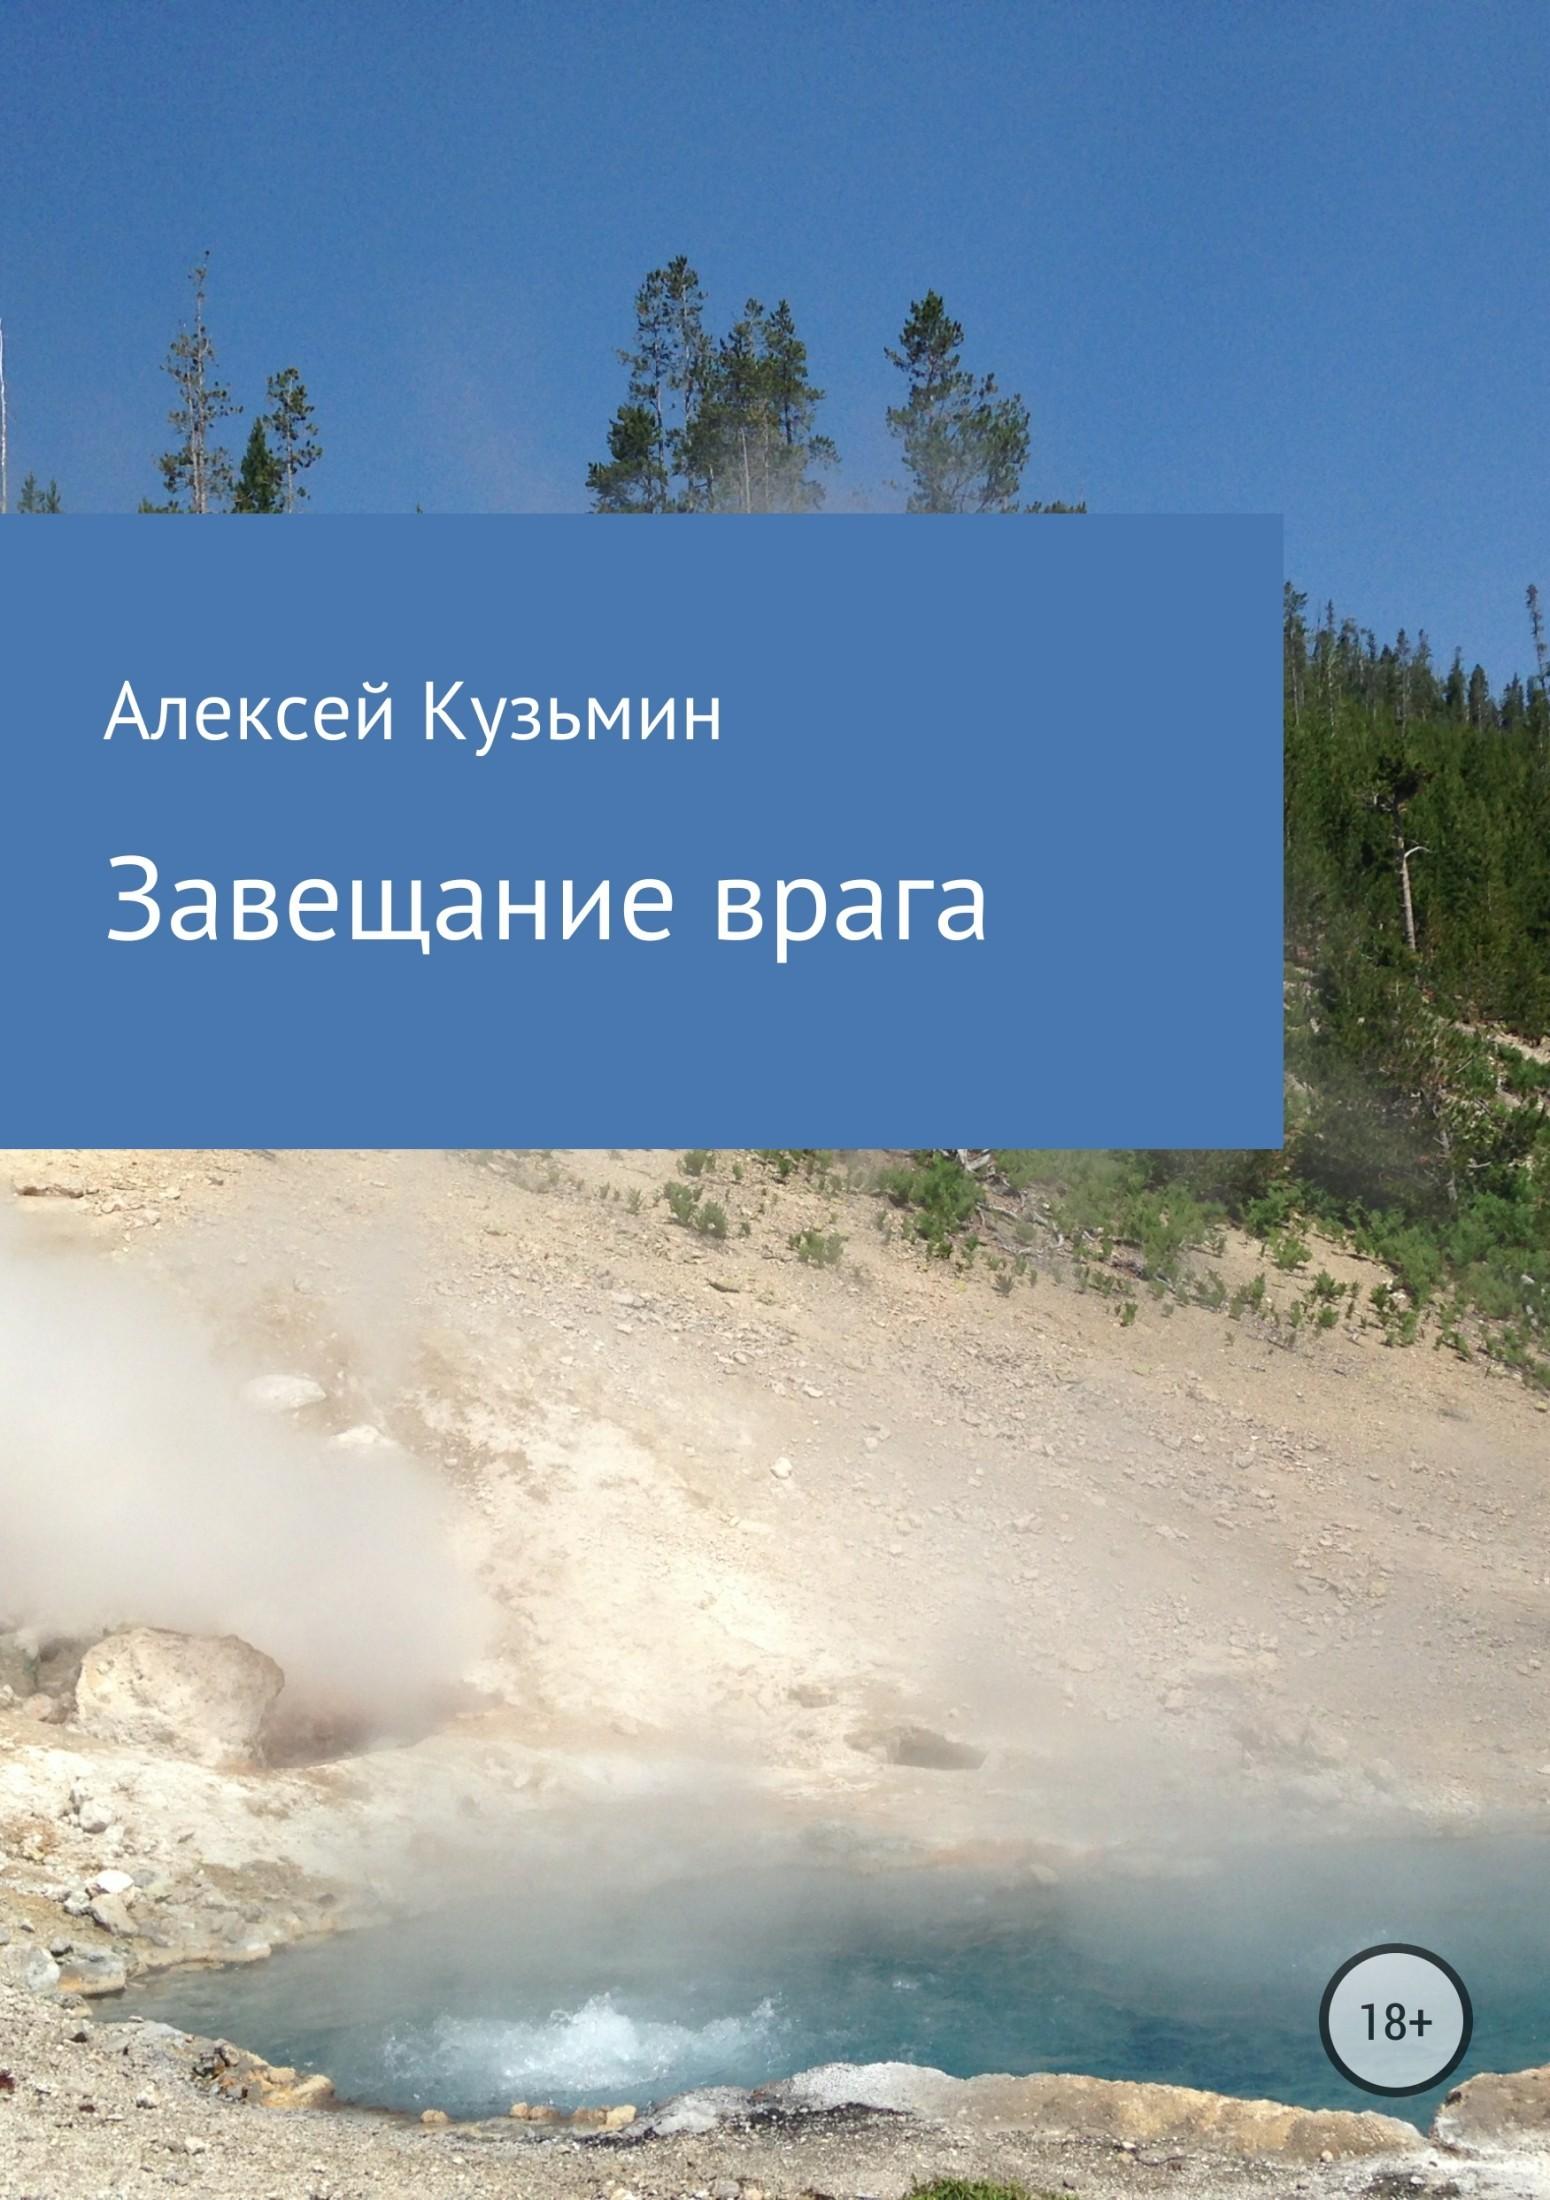 Алексей Борисович Кузьмин. Завещание врага